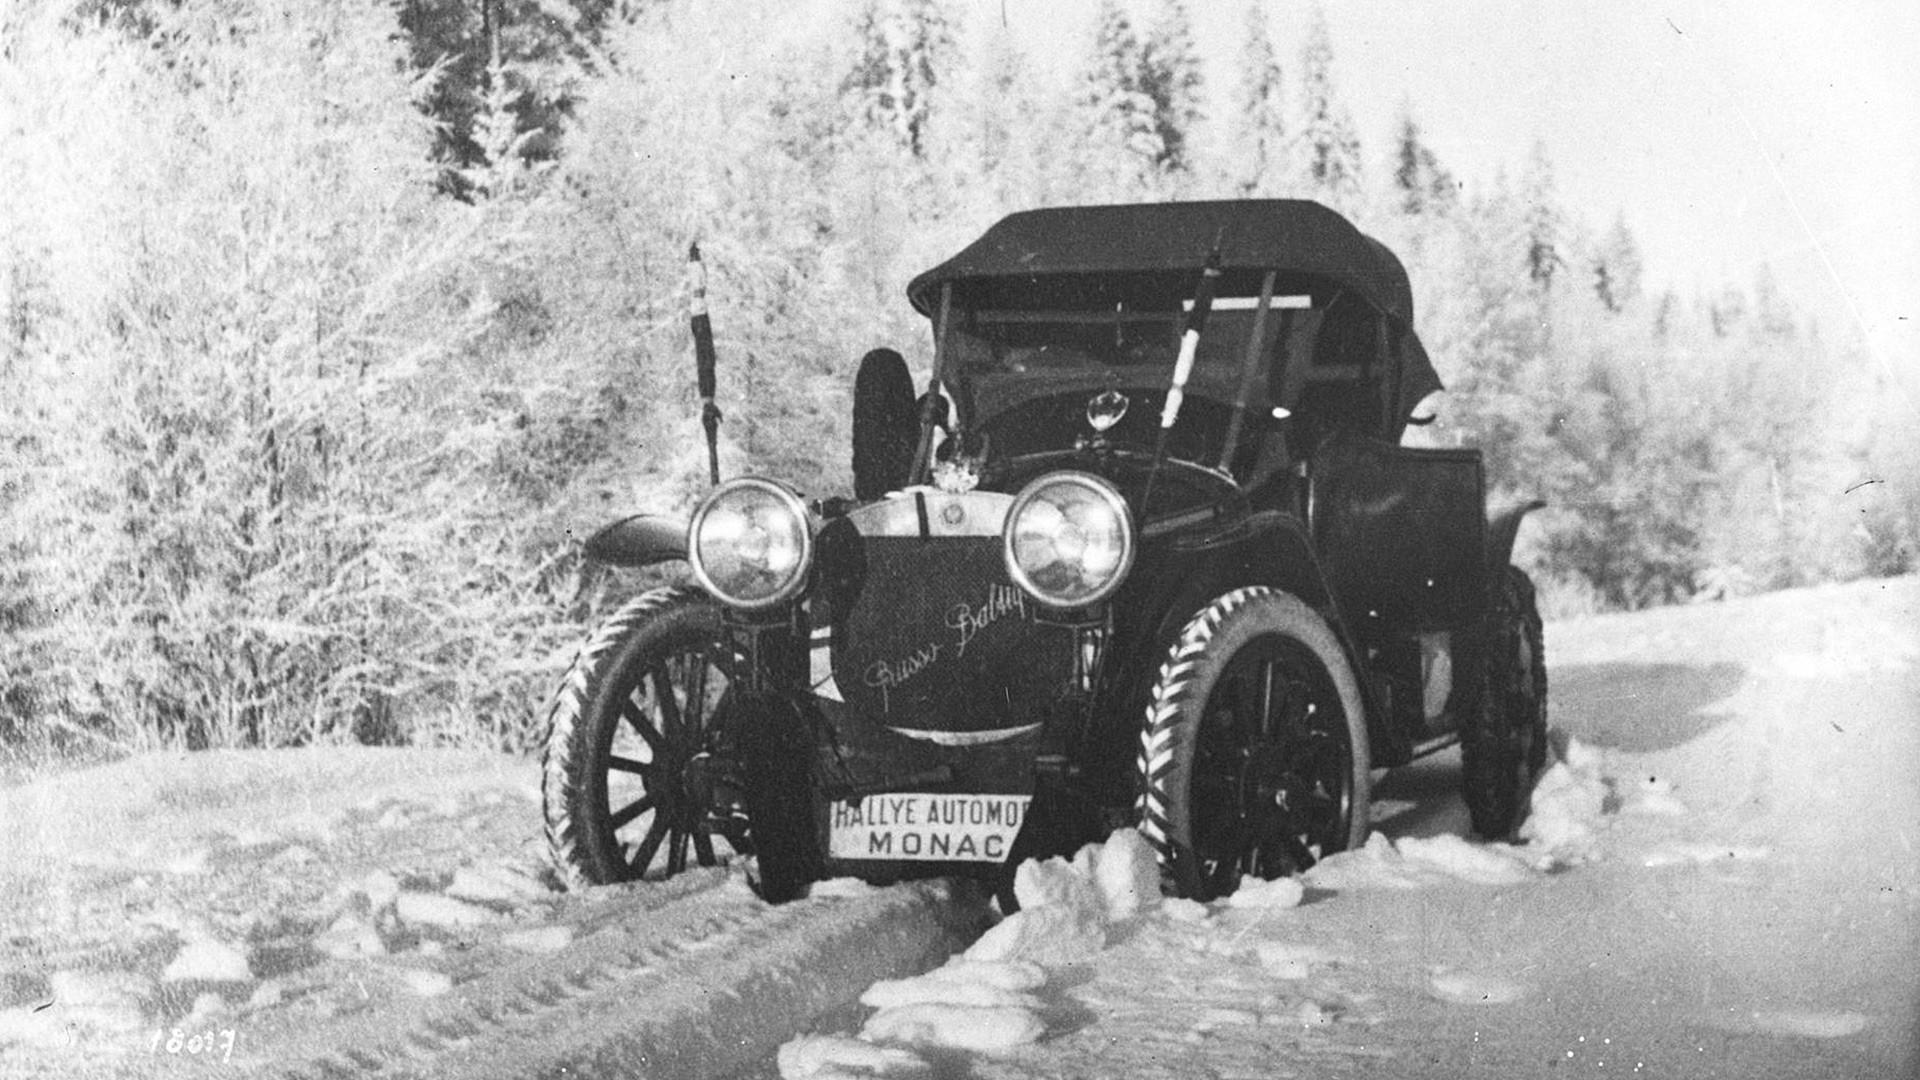 Andrej Nagels Russo-Balt-Automobil